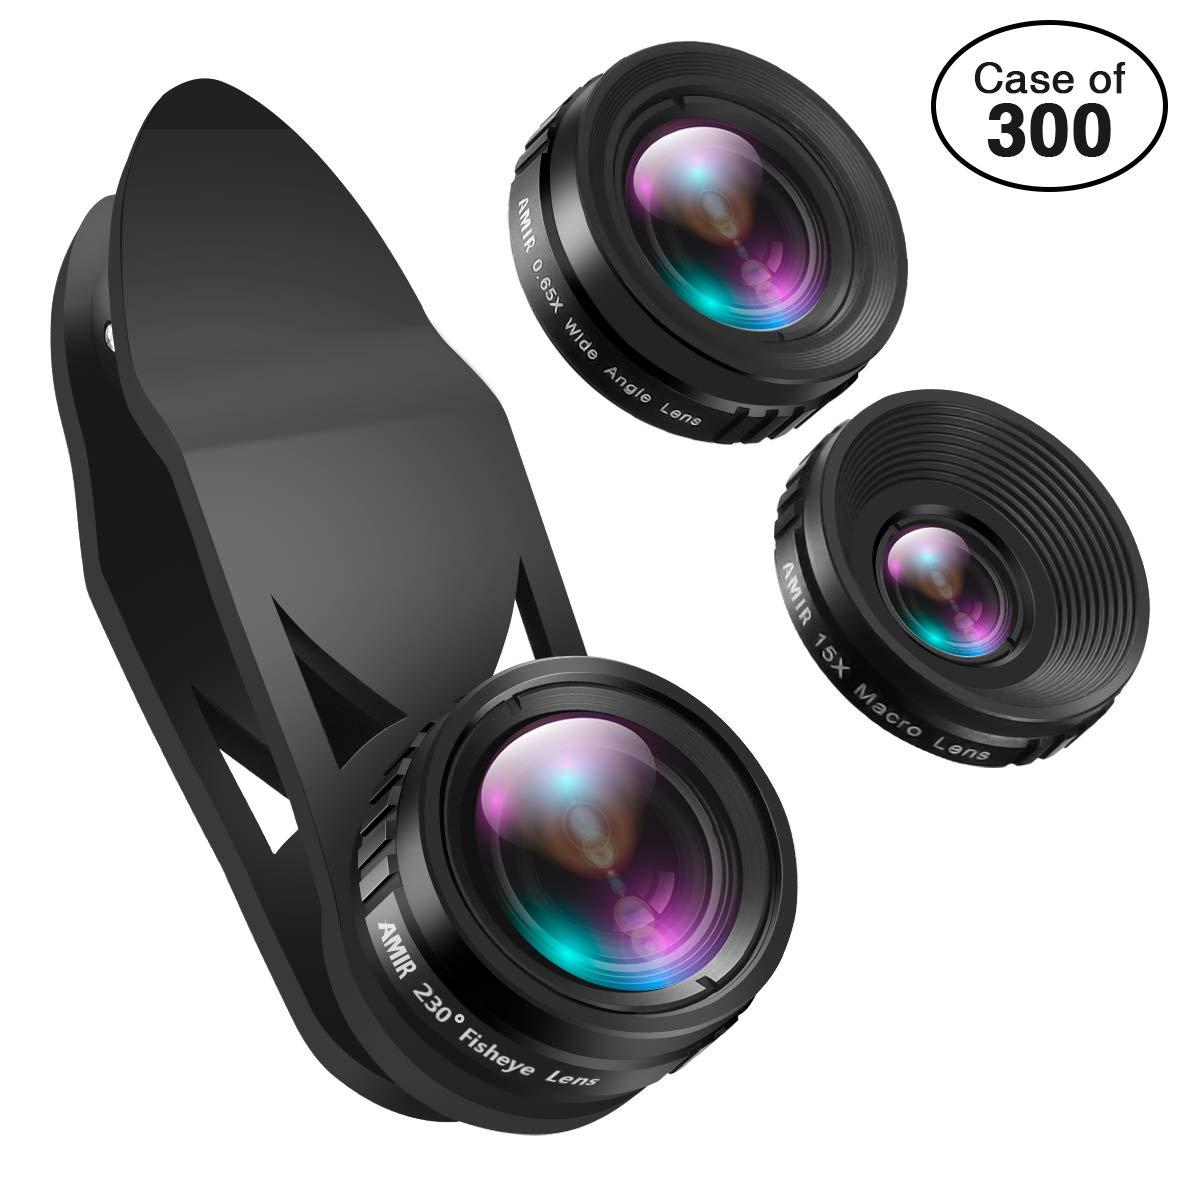 Case of 300 Packs, Phone Camera Lens, 230°Fisheye Lens + 0.65X Super Wide Angle Lens + 15X Macro Lens, Clip on 3 in 1 HD for iPhone Lens Kit for iPhone, Smartphones